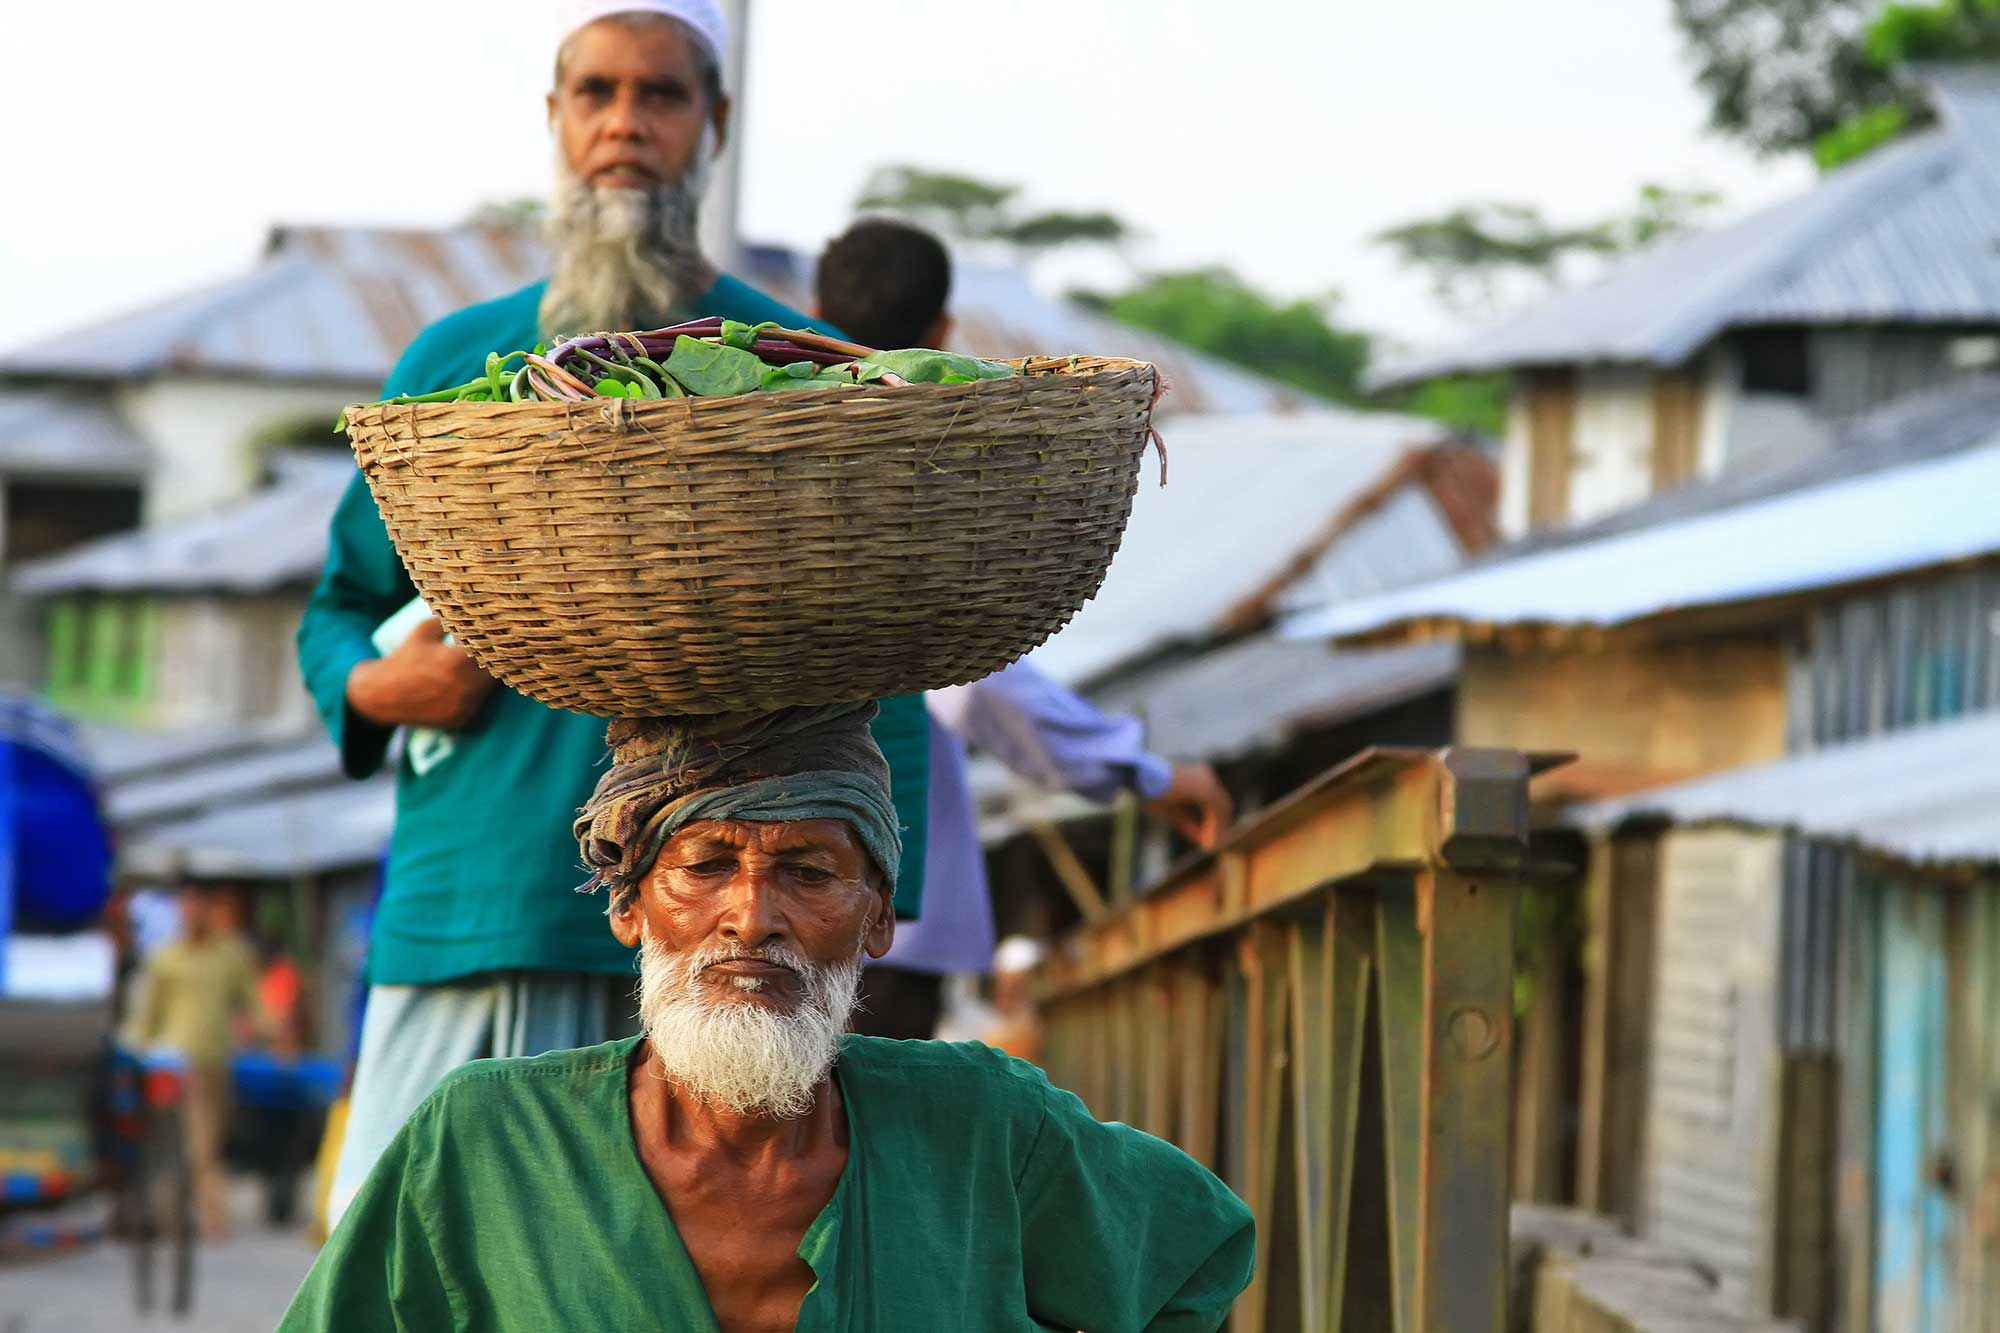 On the way to the market in Galachipa, Bangladesh. © Ulli Maier & Nisa Maier